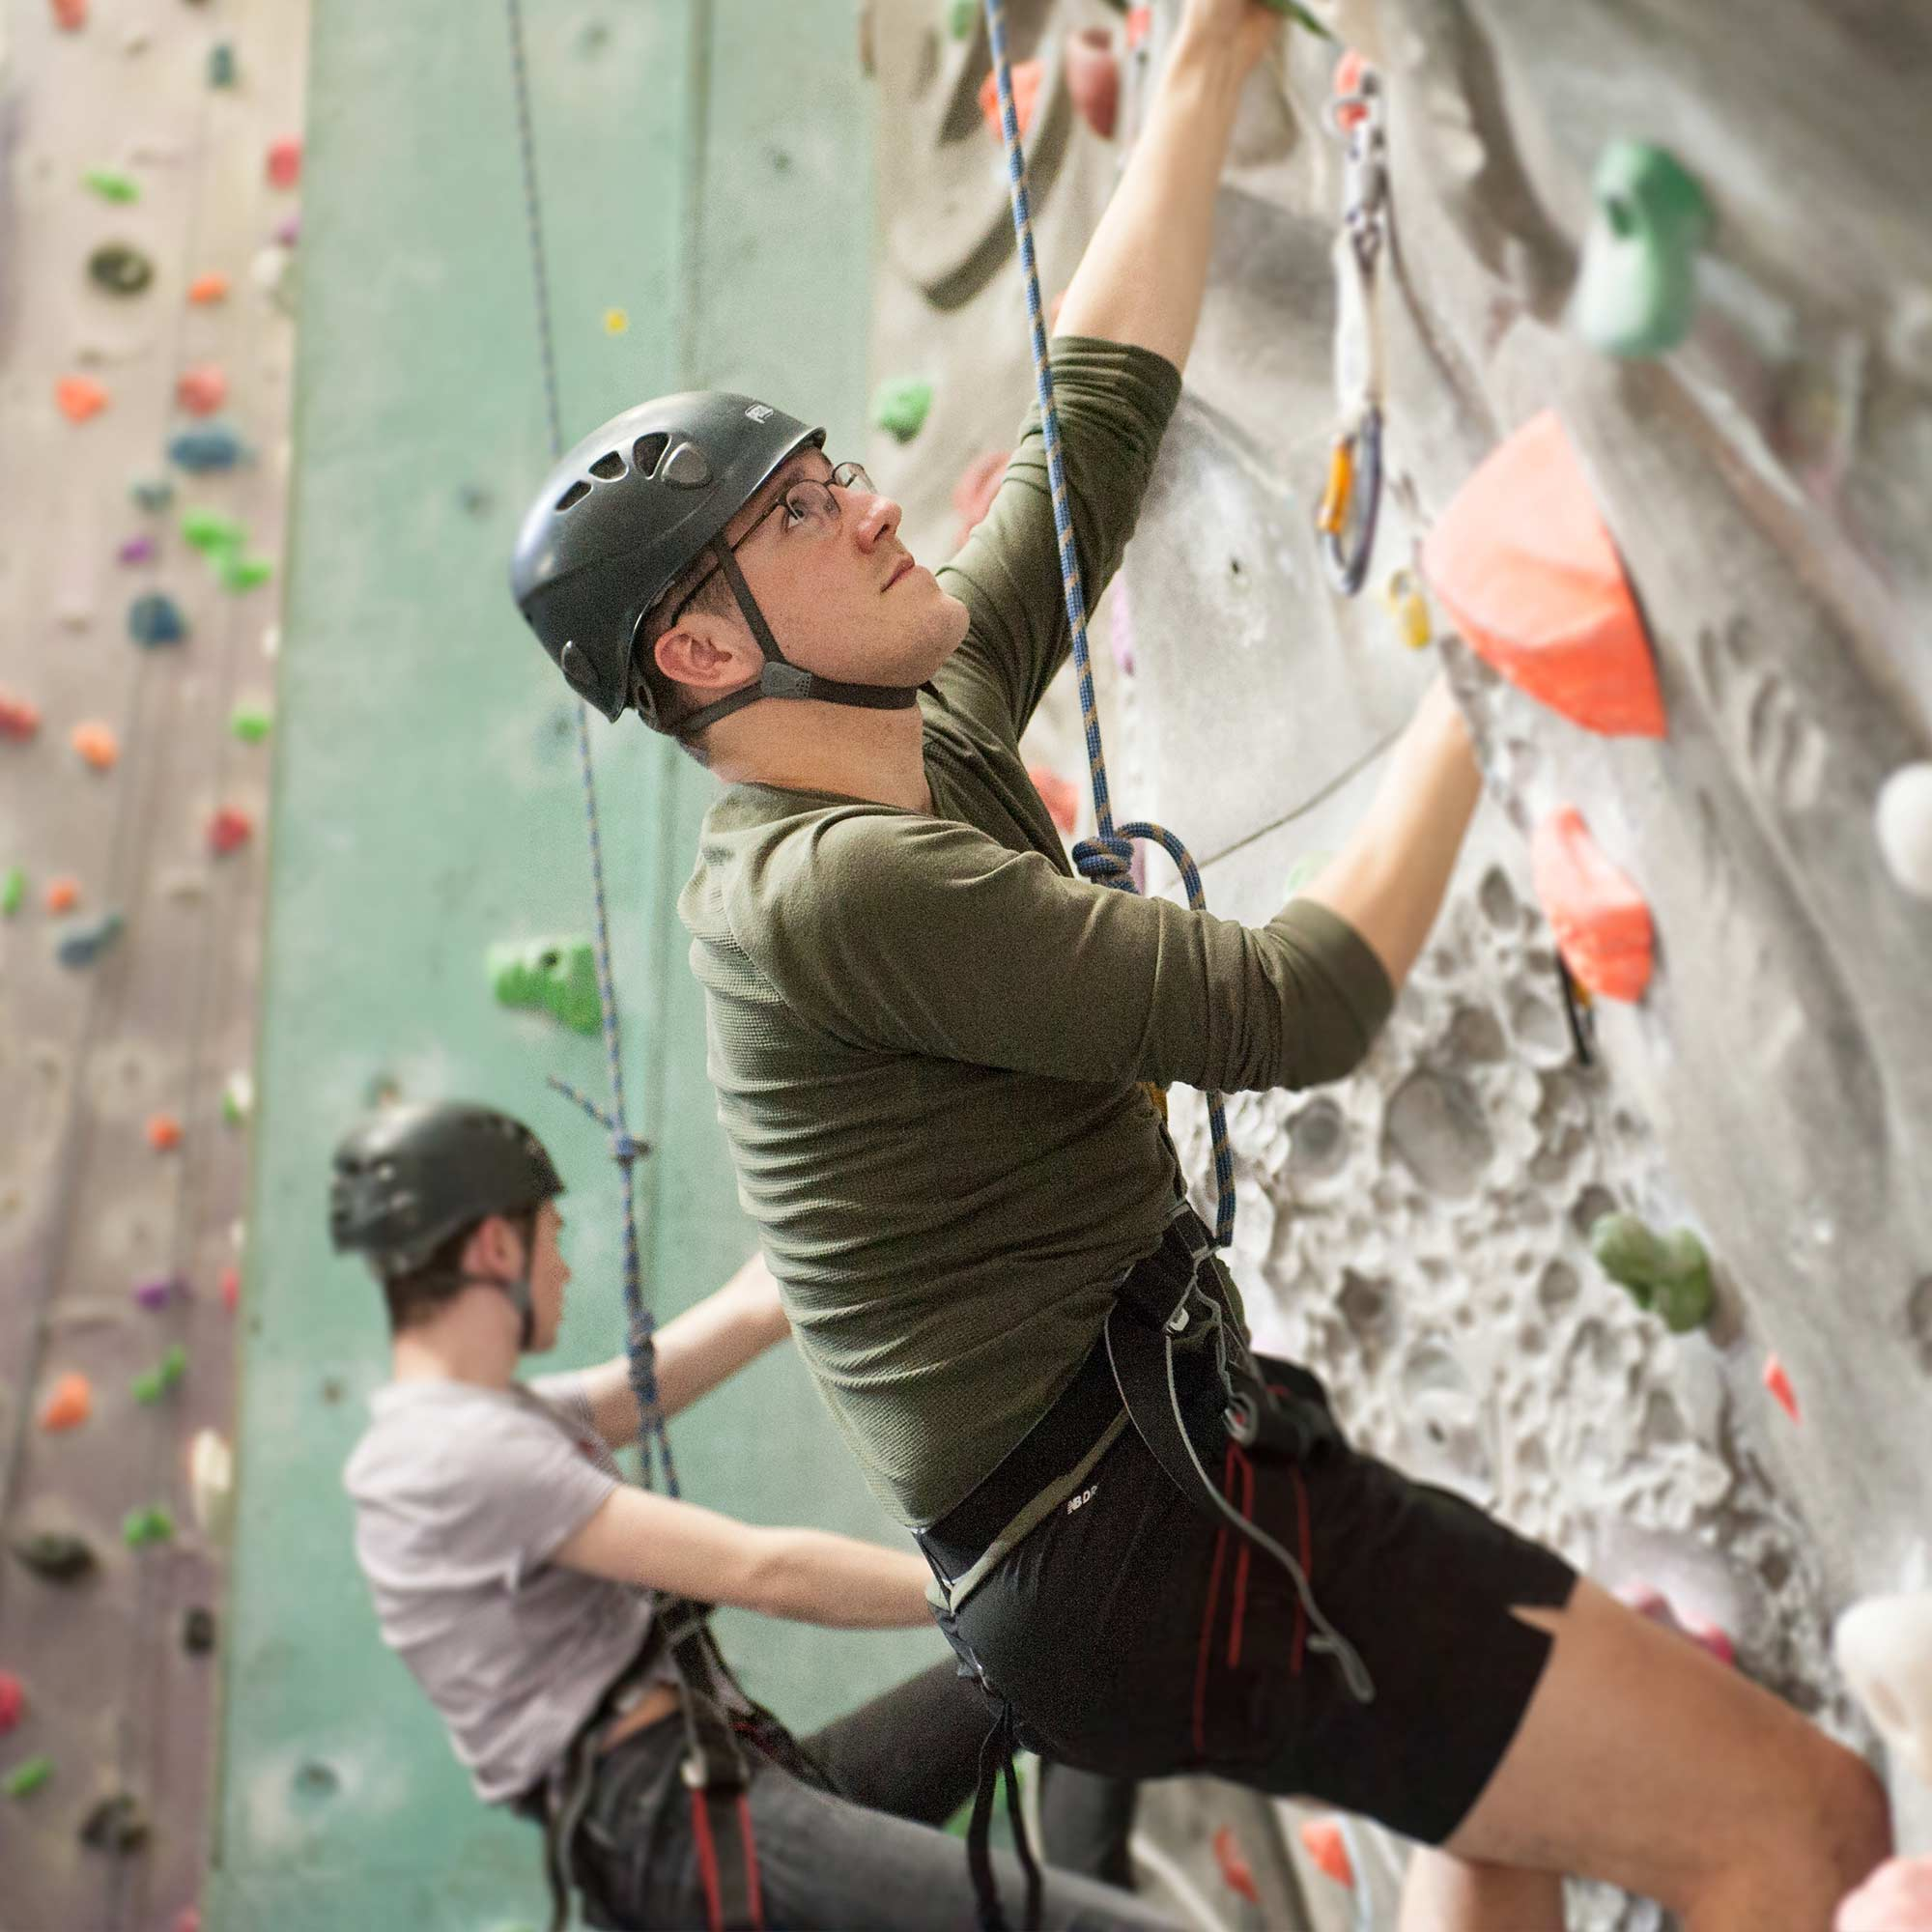 Student using an indoor climbing wall